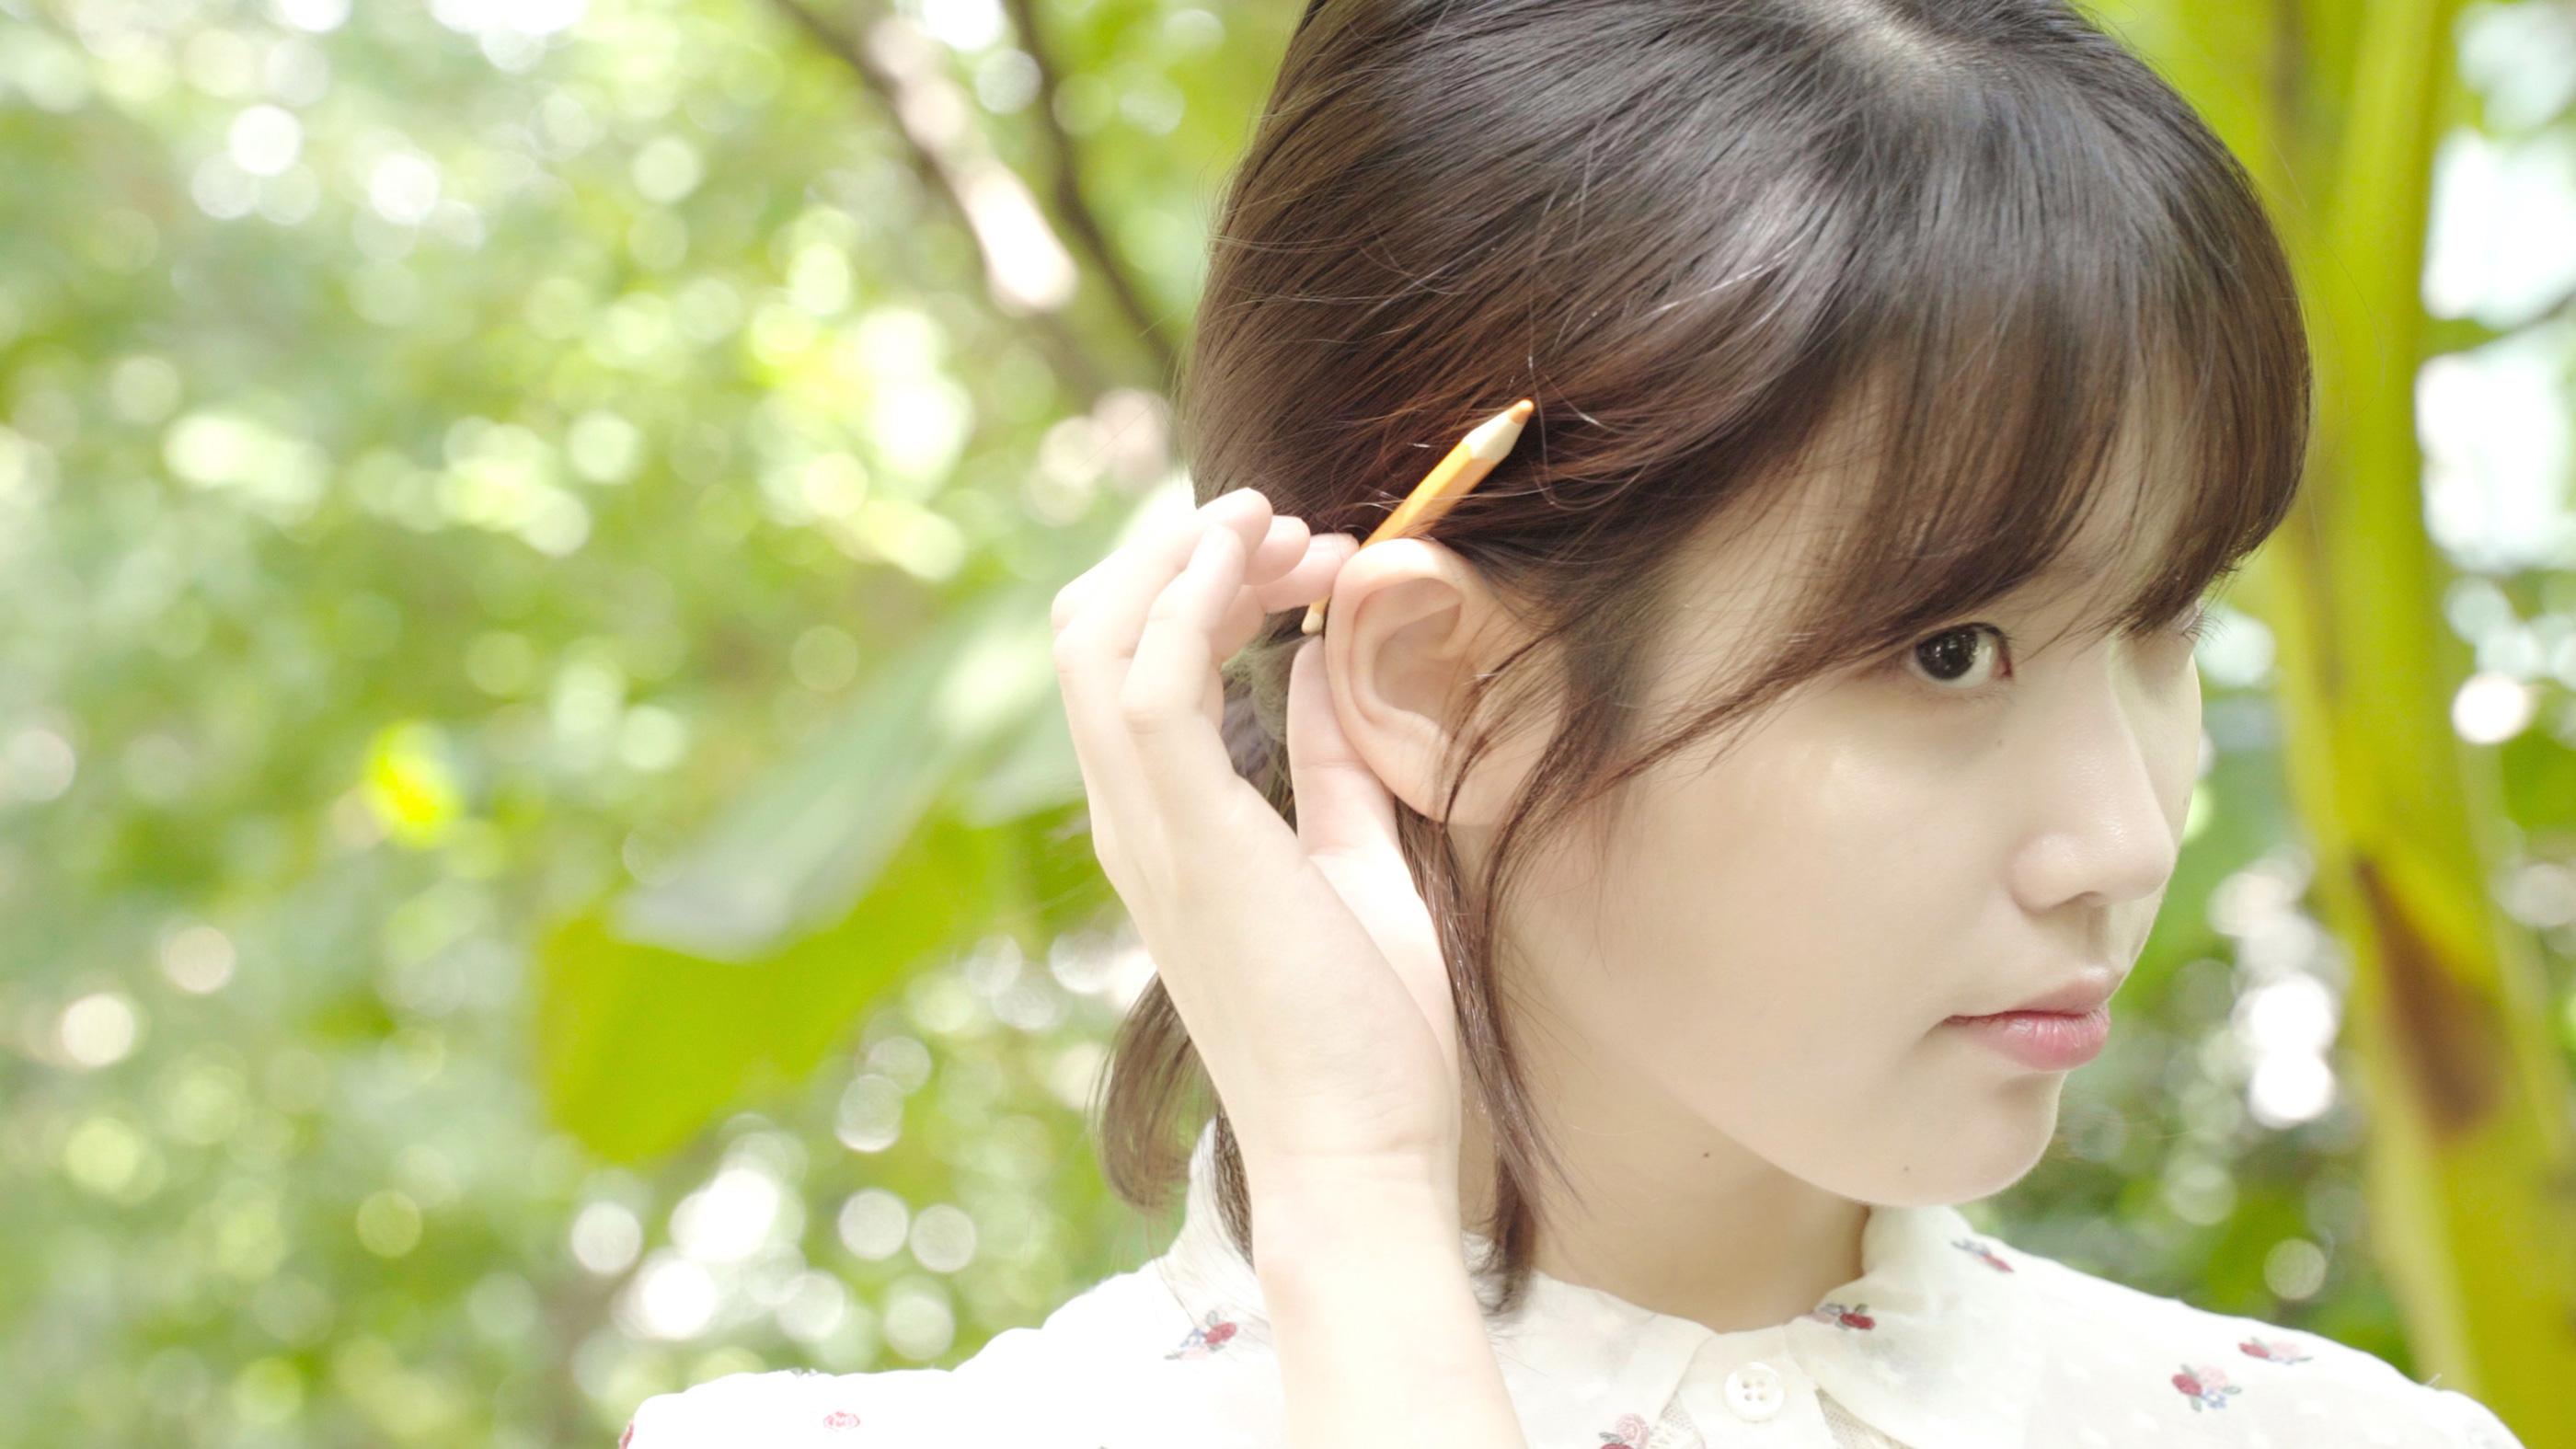 [IU TV] '꽃갈피 둘(Kkot-Galpi #2)' Album Making #1